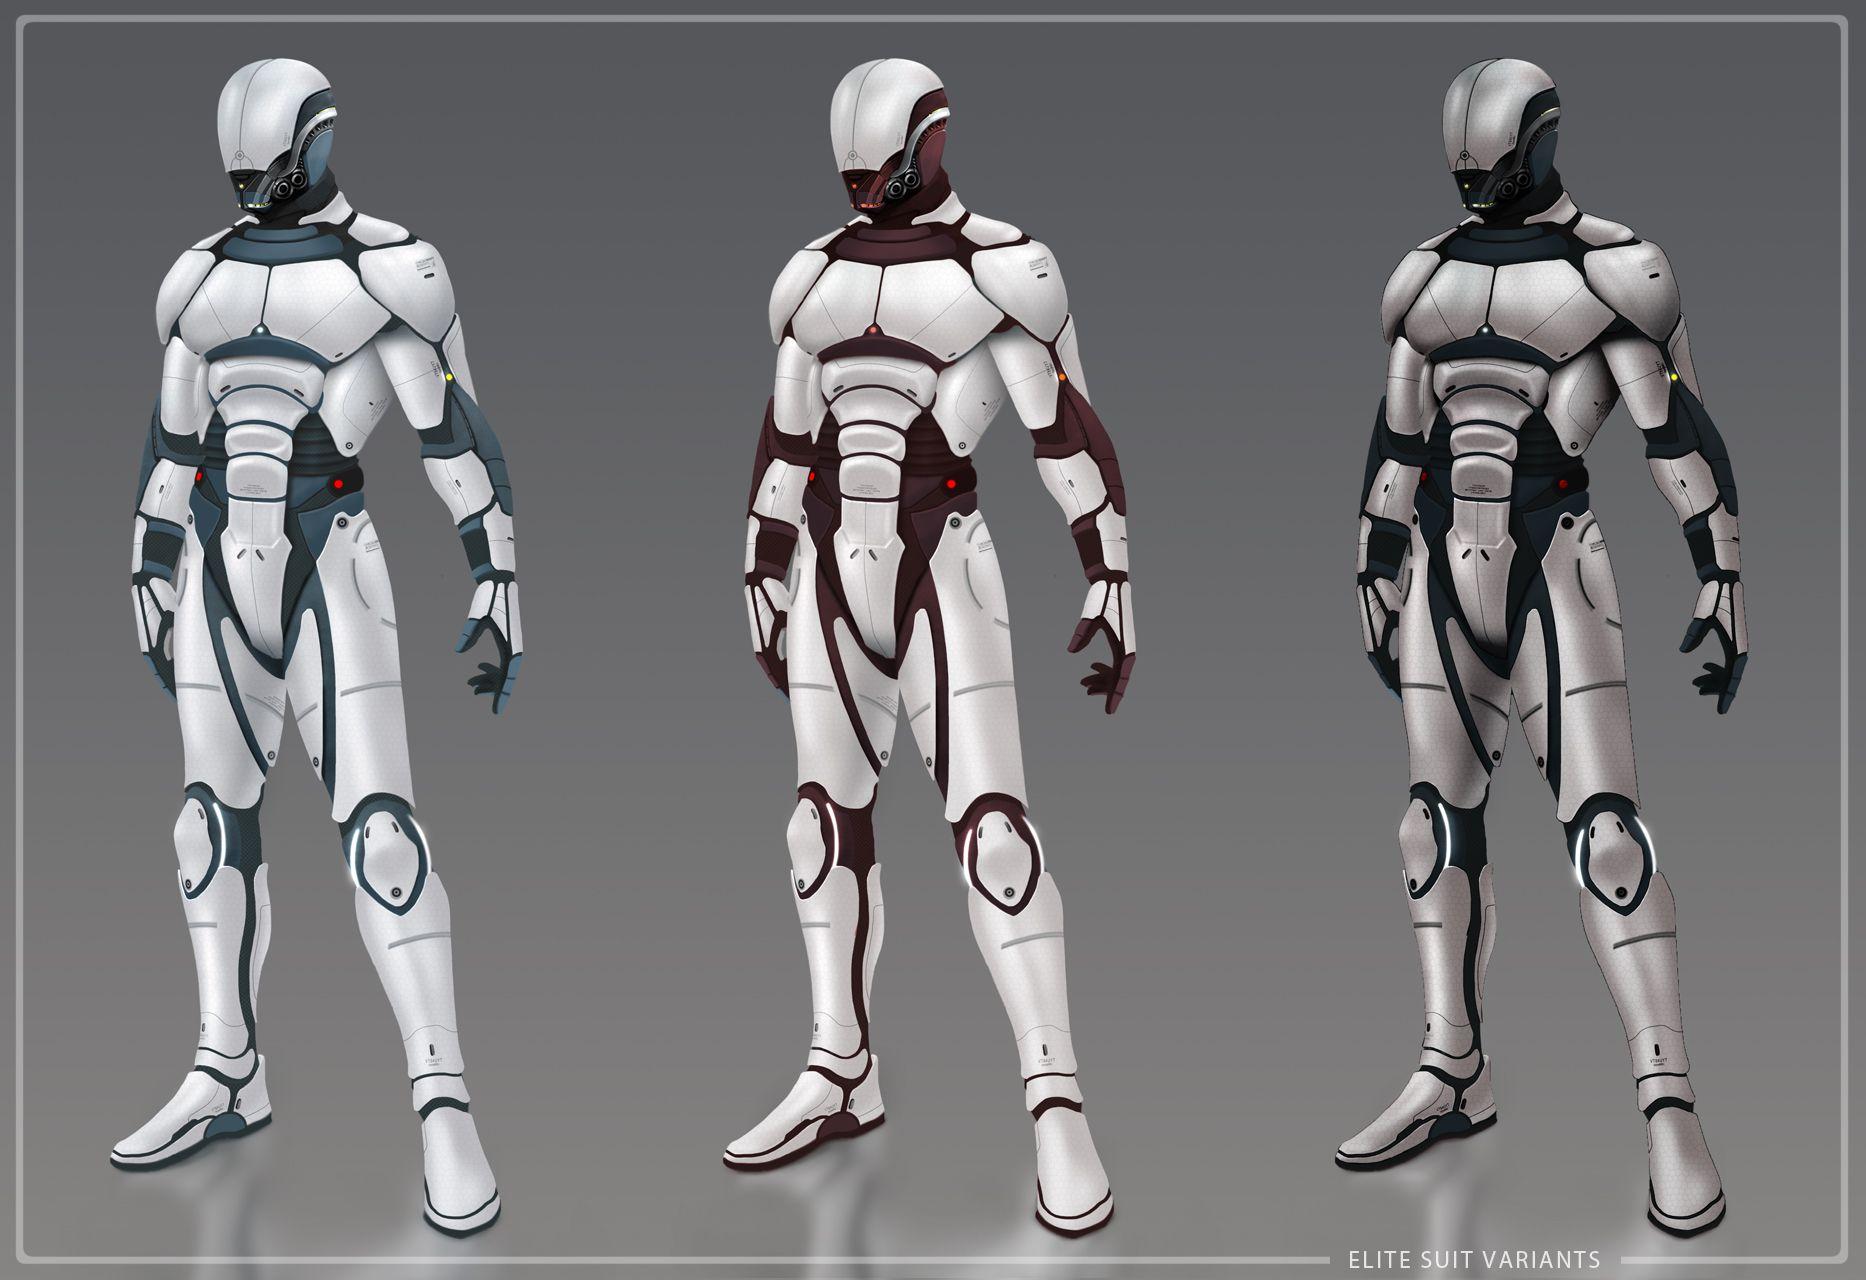 Hard Suit Armor Concept Art Google Search Robot Concept Art Sci Fi Concept Art Armor Concept